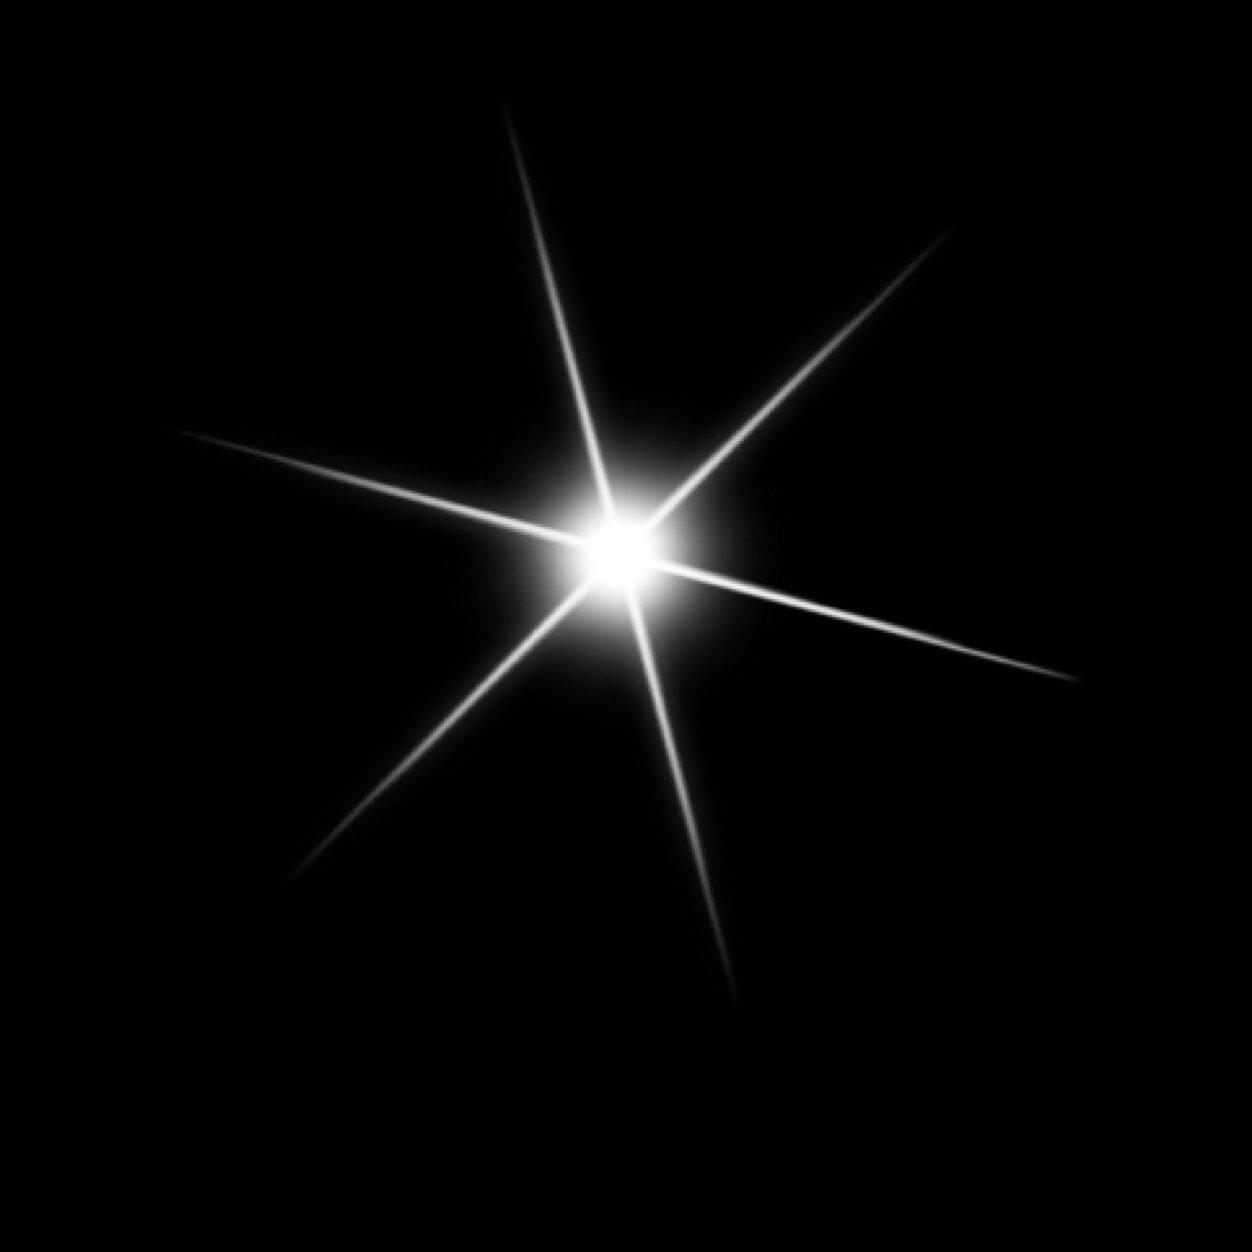 star light   lightstarlights  twitter starburst graphic insert text starburst graphic png